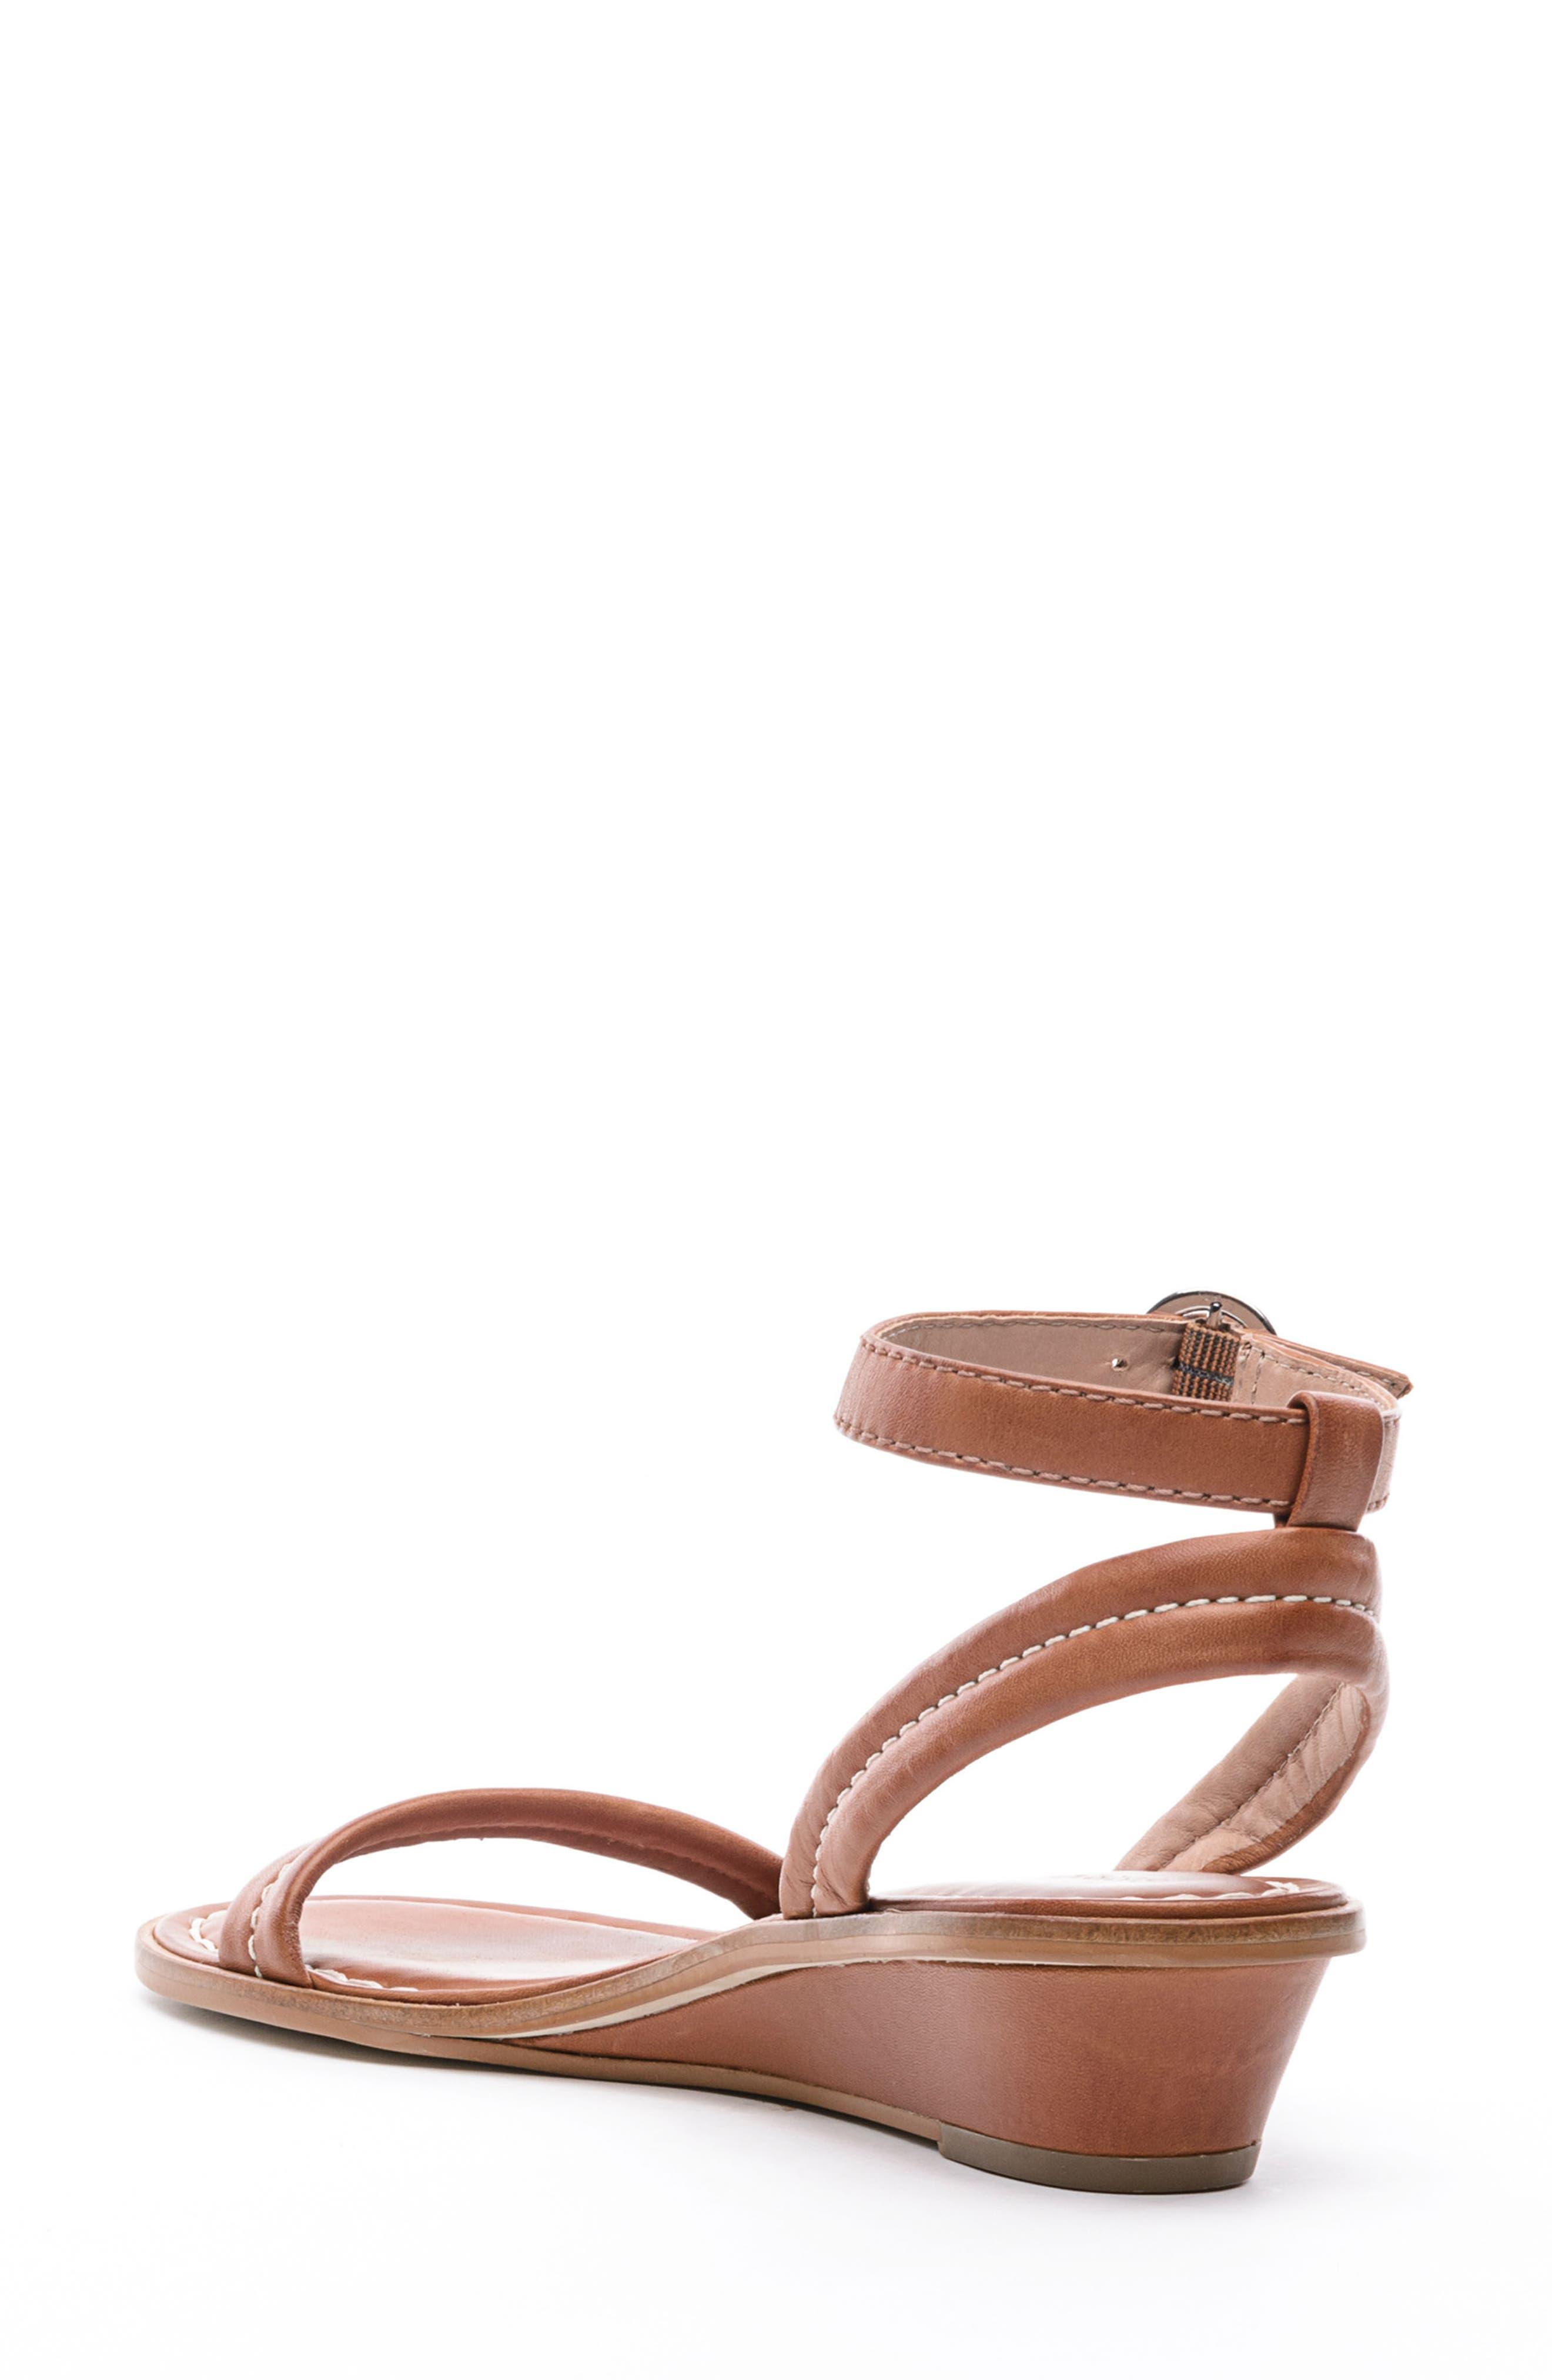 BERNARDO, Catherine Ankle Strap Sandal, Alternate thumbnail 2, color, LUGGAGE BROWN ANTIQUE